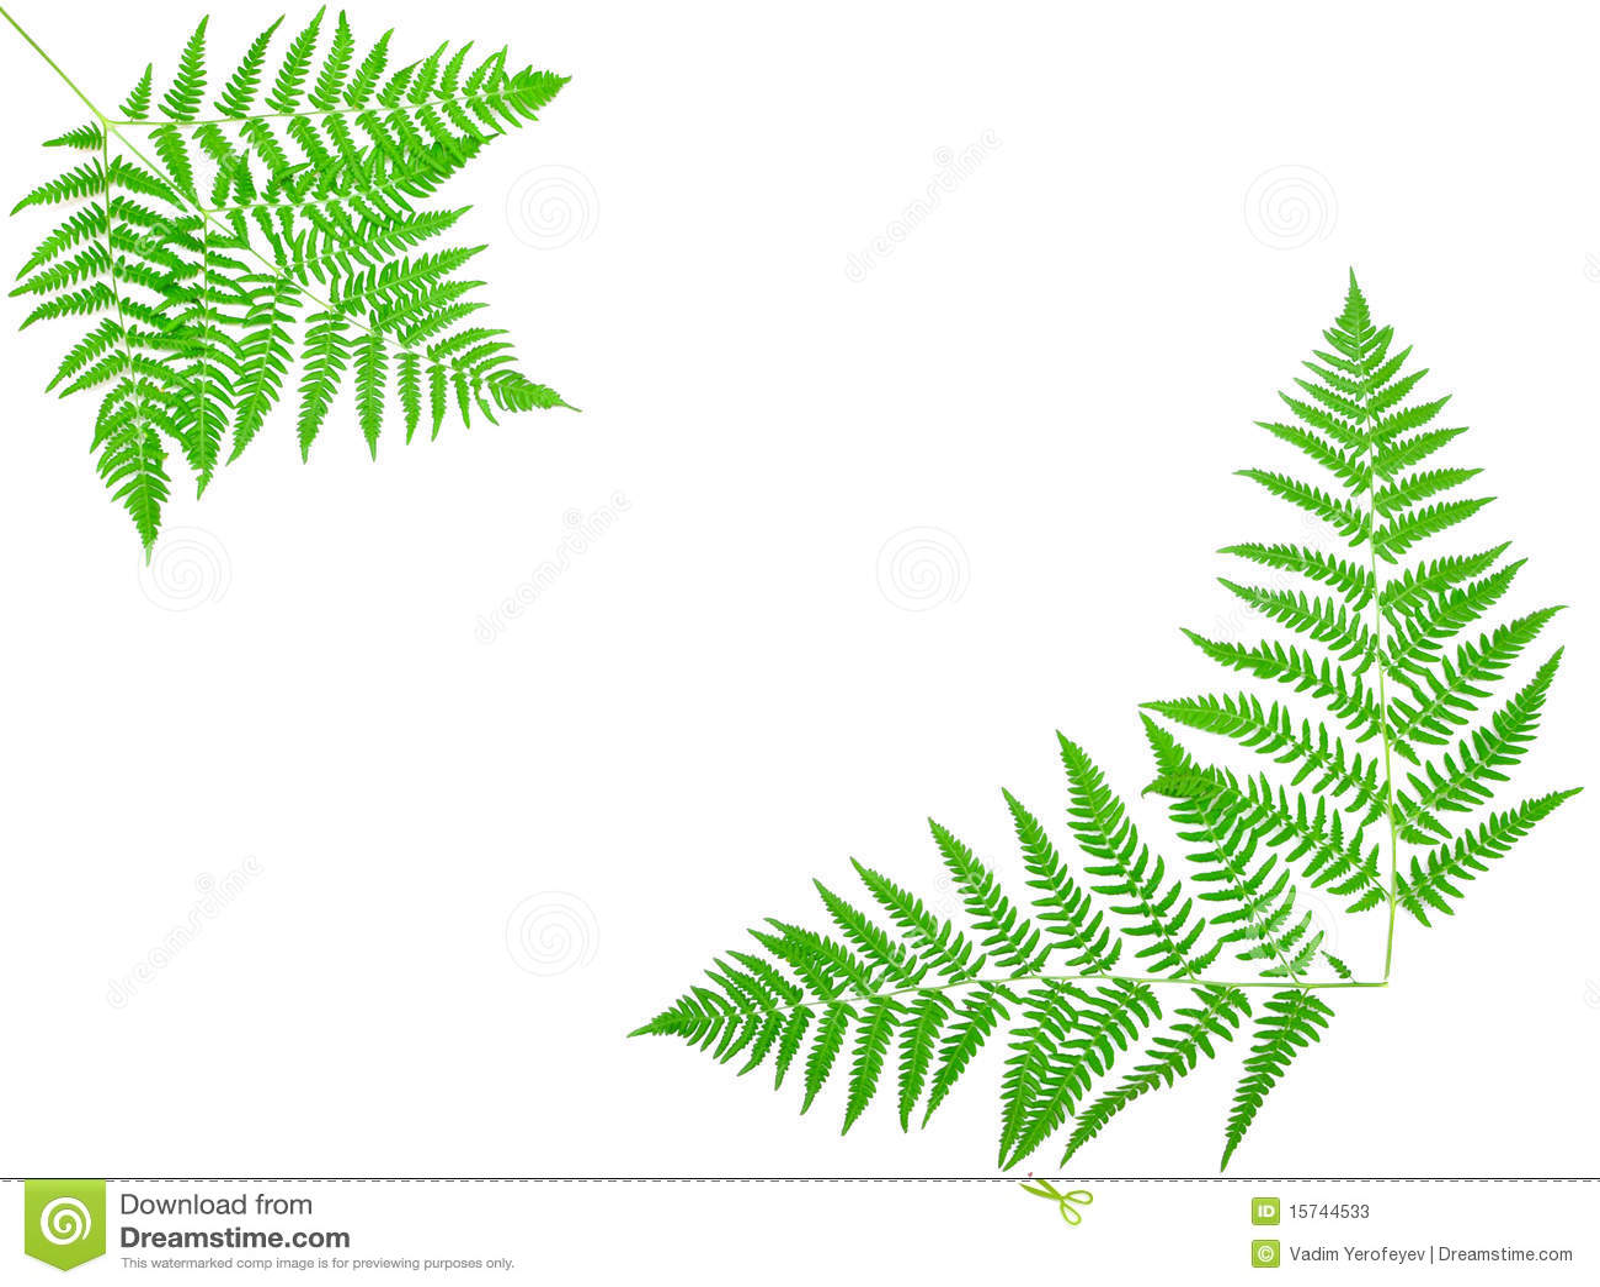 Hoja Verde Joven Del Helecho Imagen de archivo - Imagen de planta ...